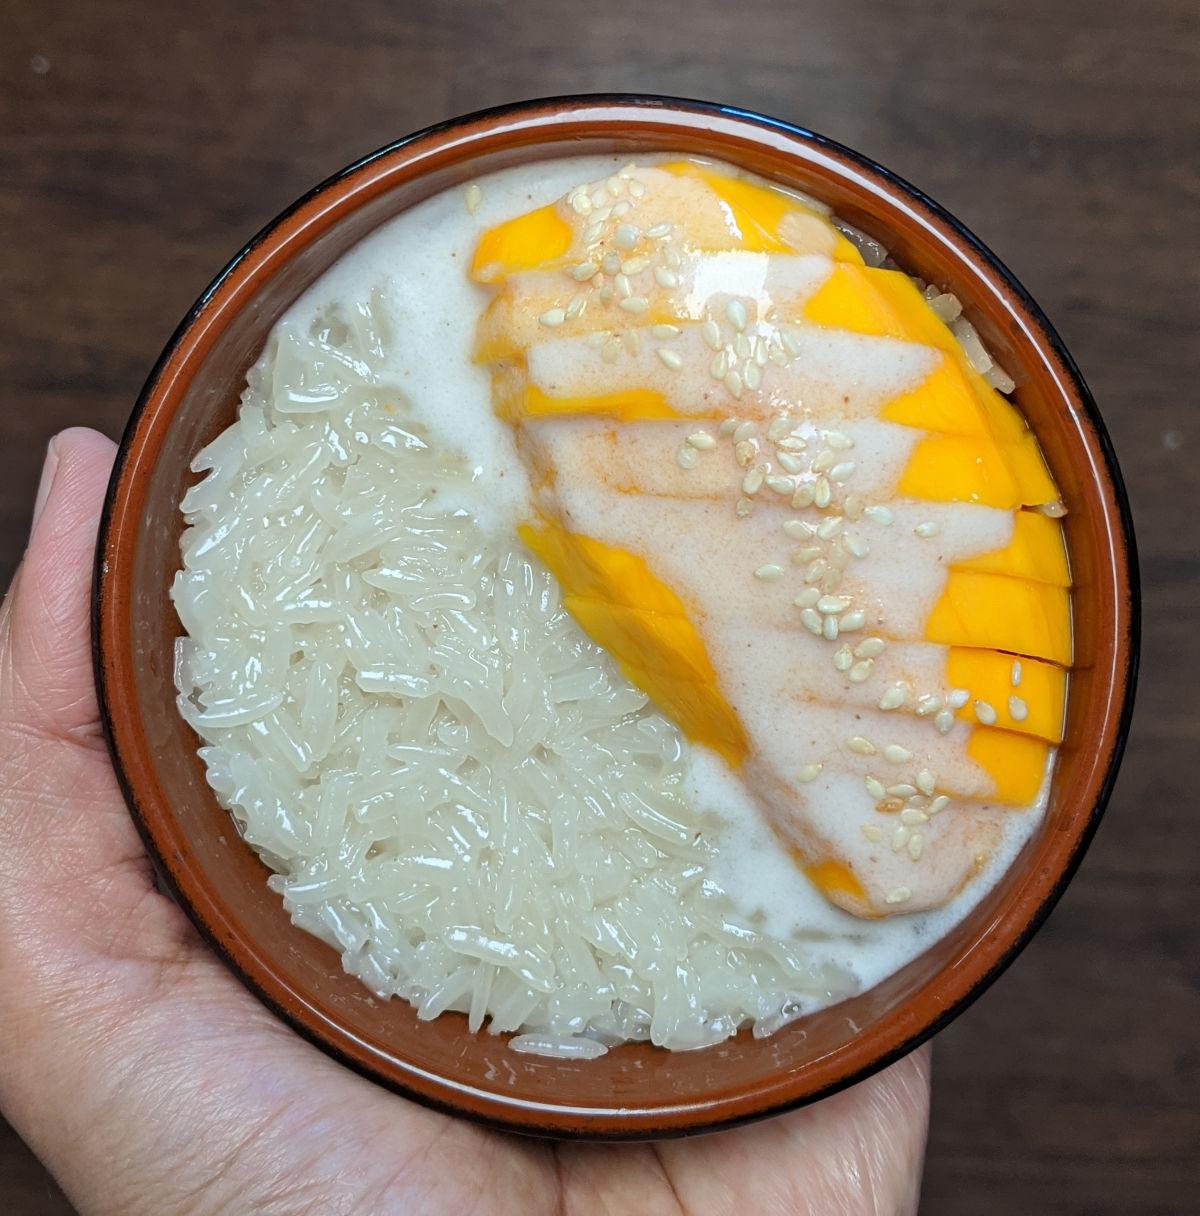 Sticky rice with mango, #1 Thai dessert - Plateful of veggies